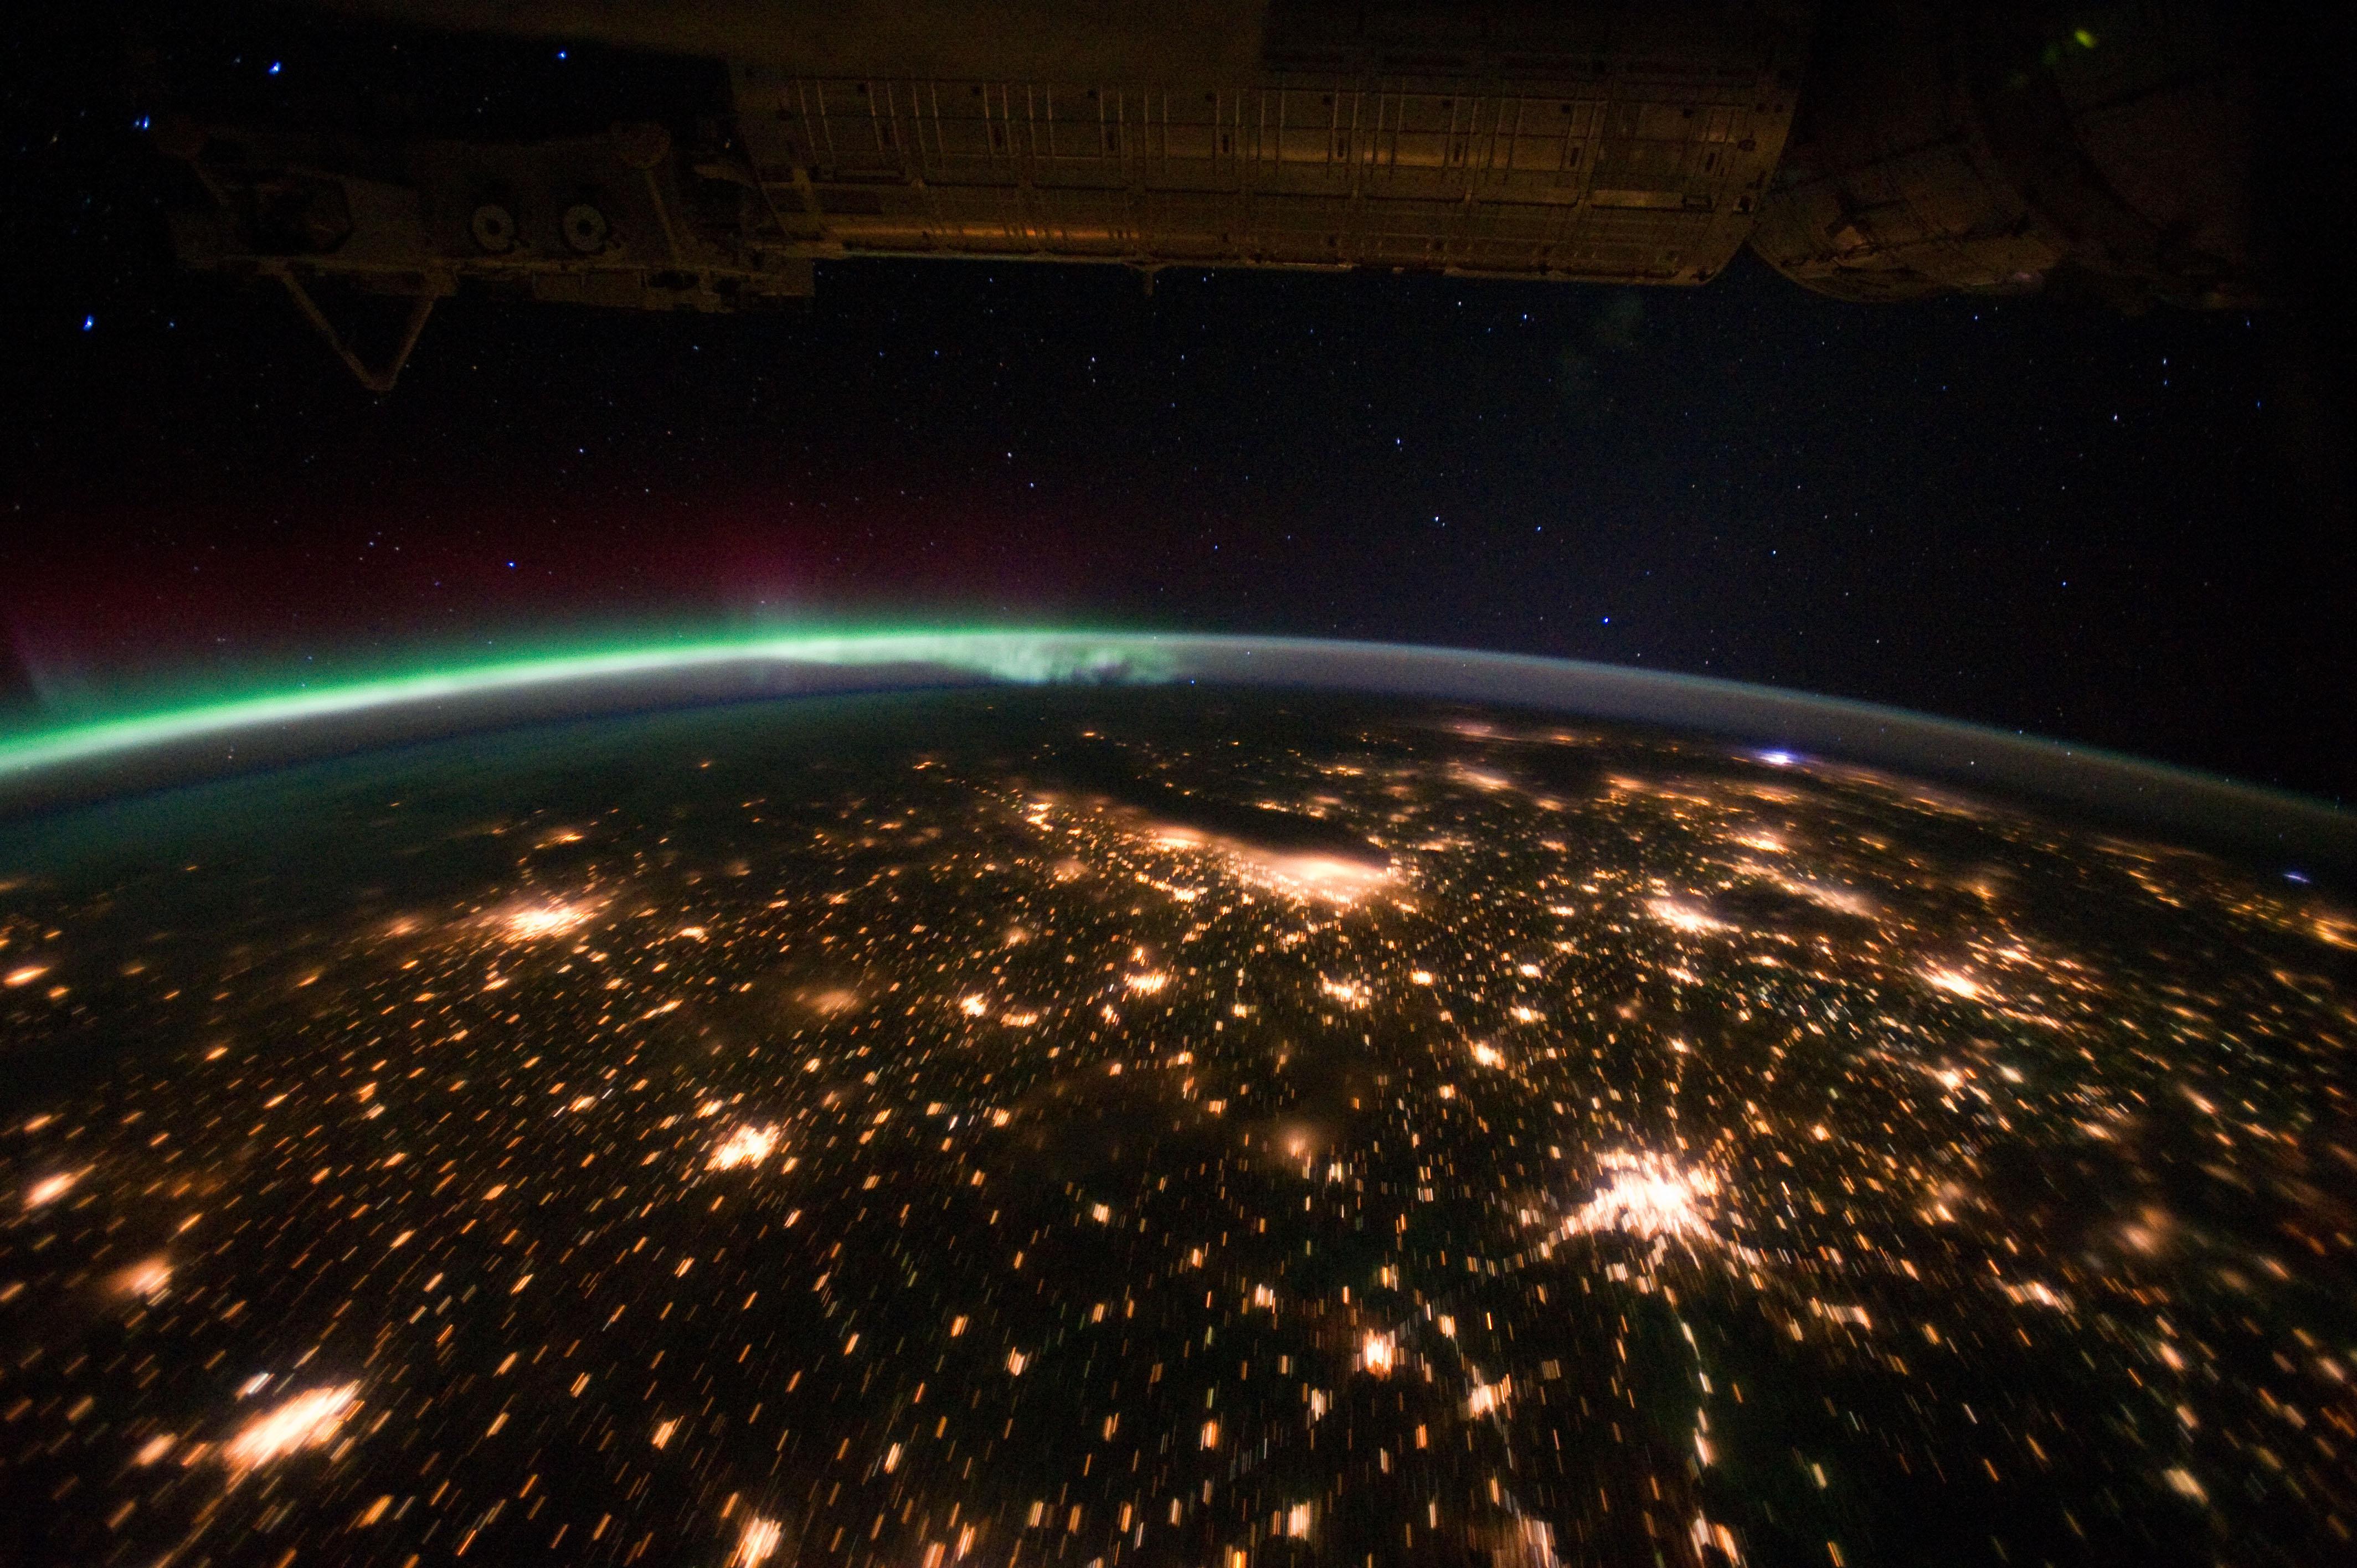 nasa night view of earth - photo #29